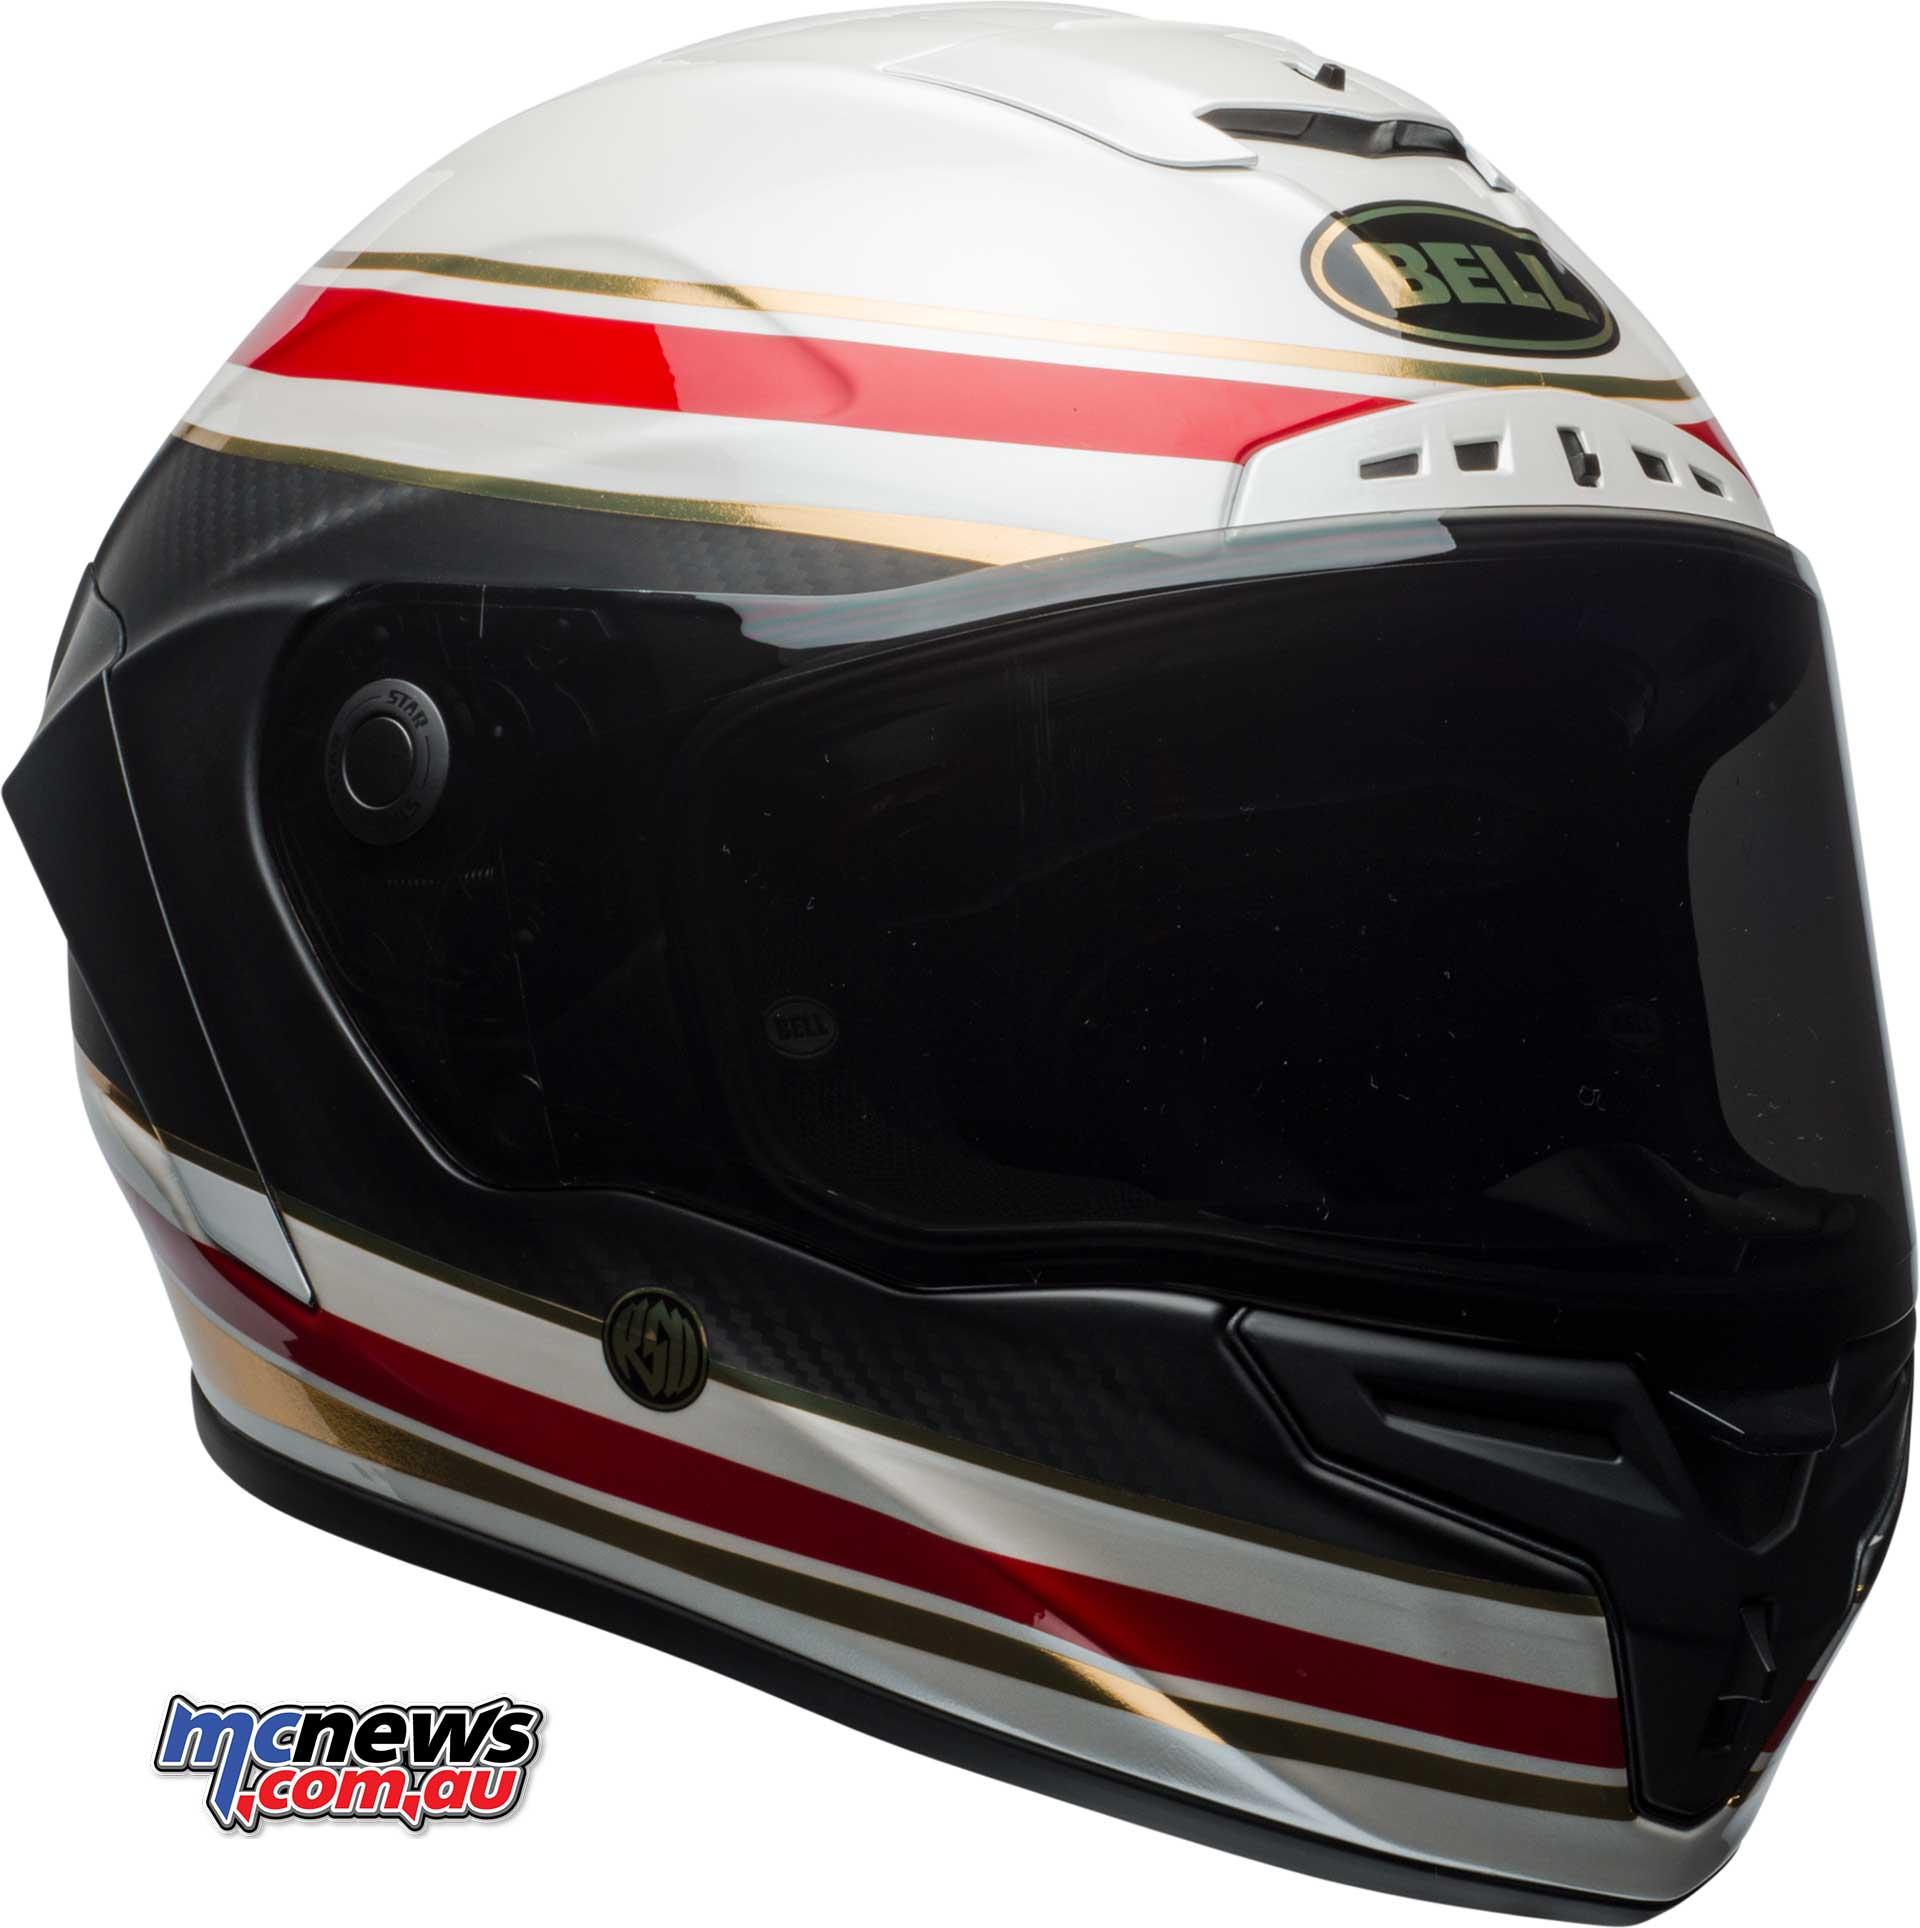 Bell Racing Helmets >> New Bell Race Star hits Australian market | MCNews.com.au